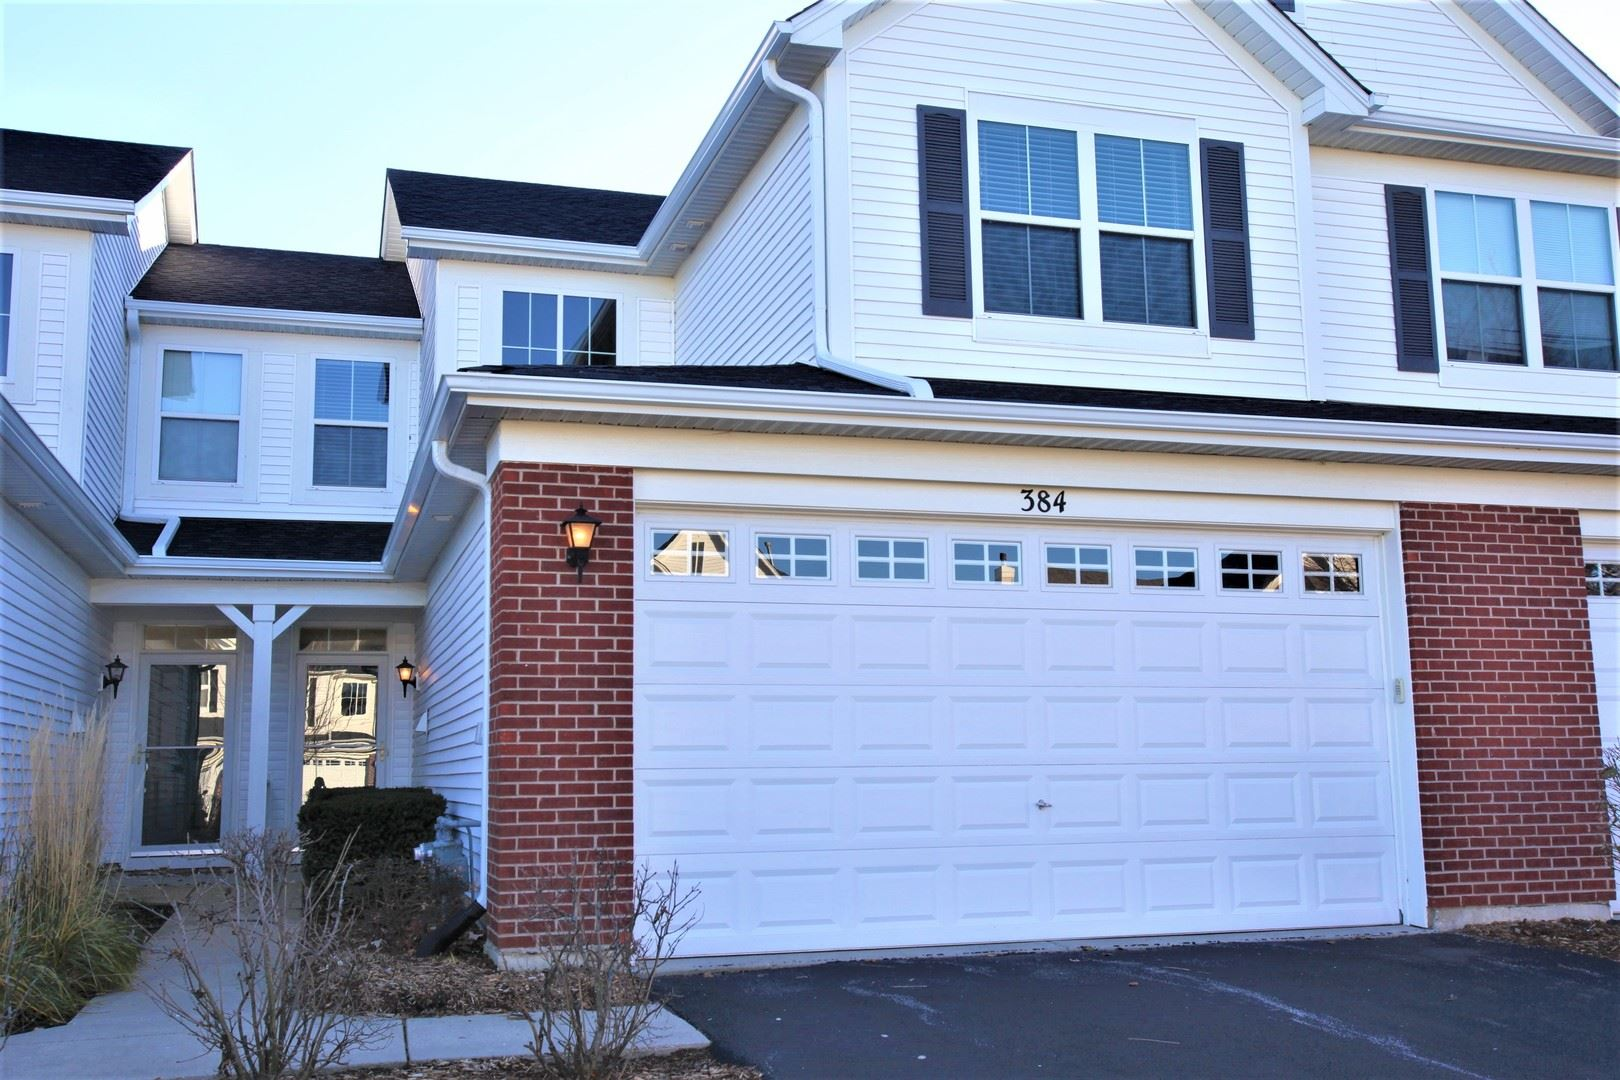 Photo of 384 Chesapeake Lane, Oswego, IL 60543 (MLS # 10942550)